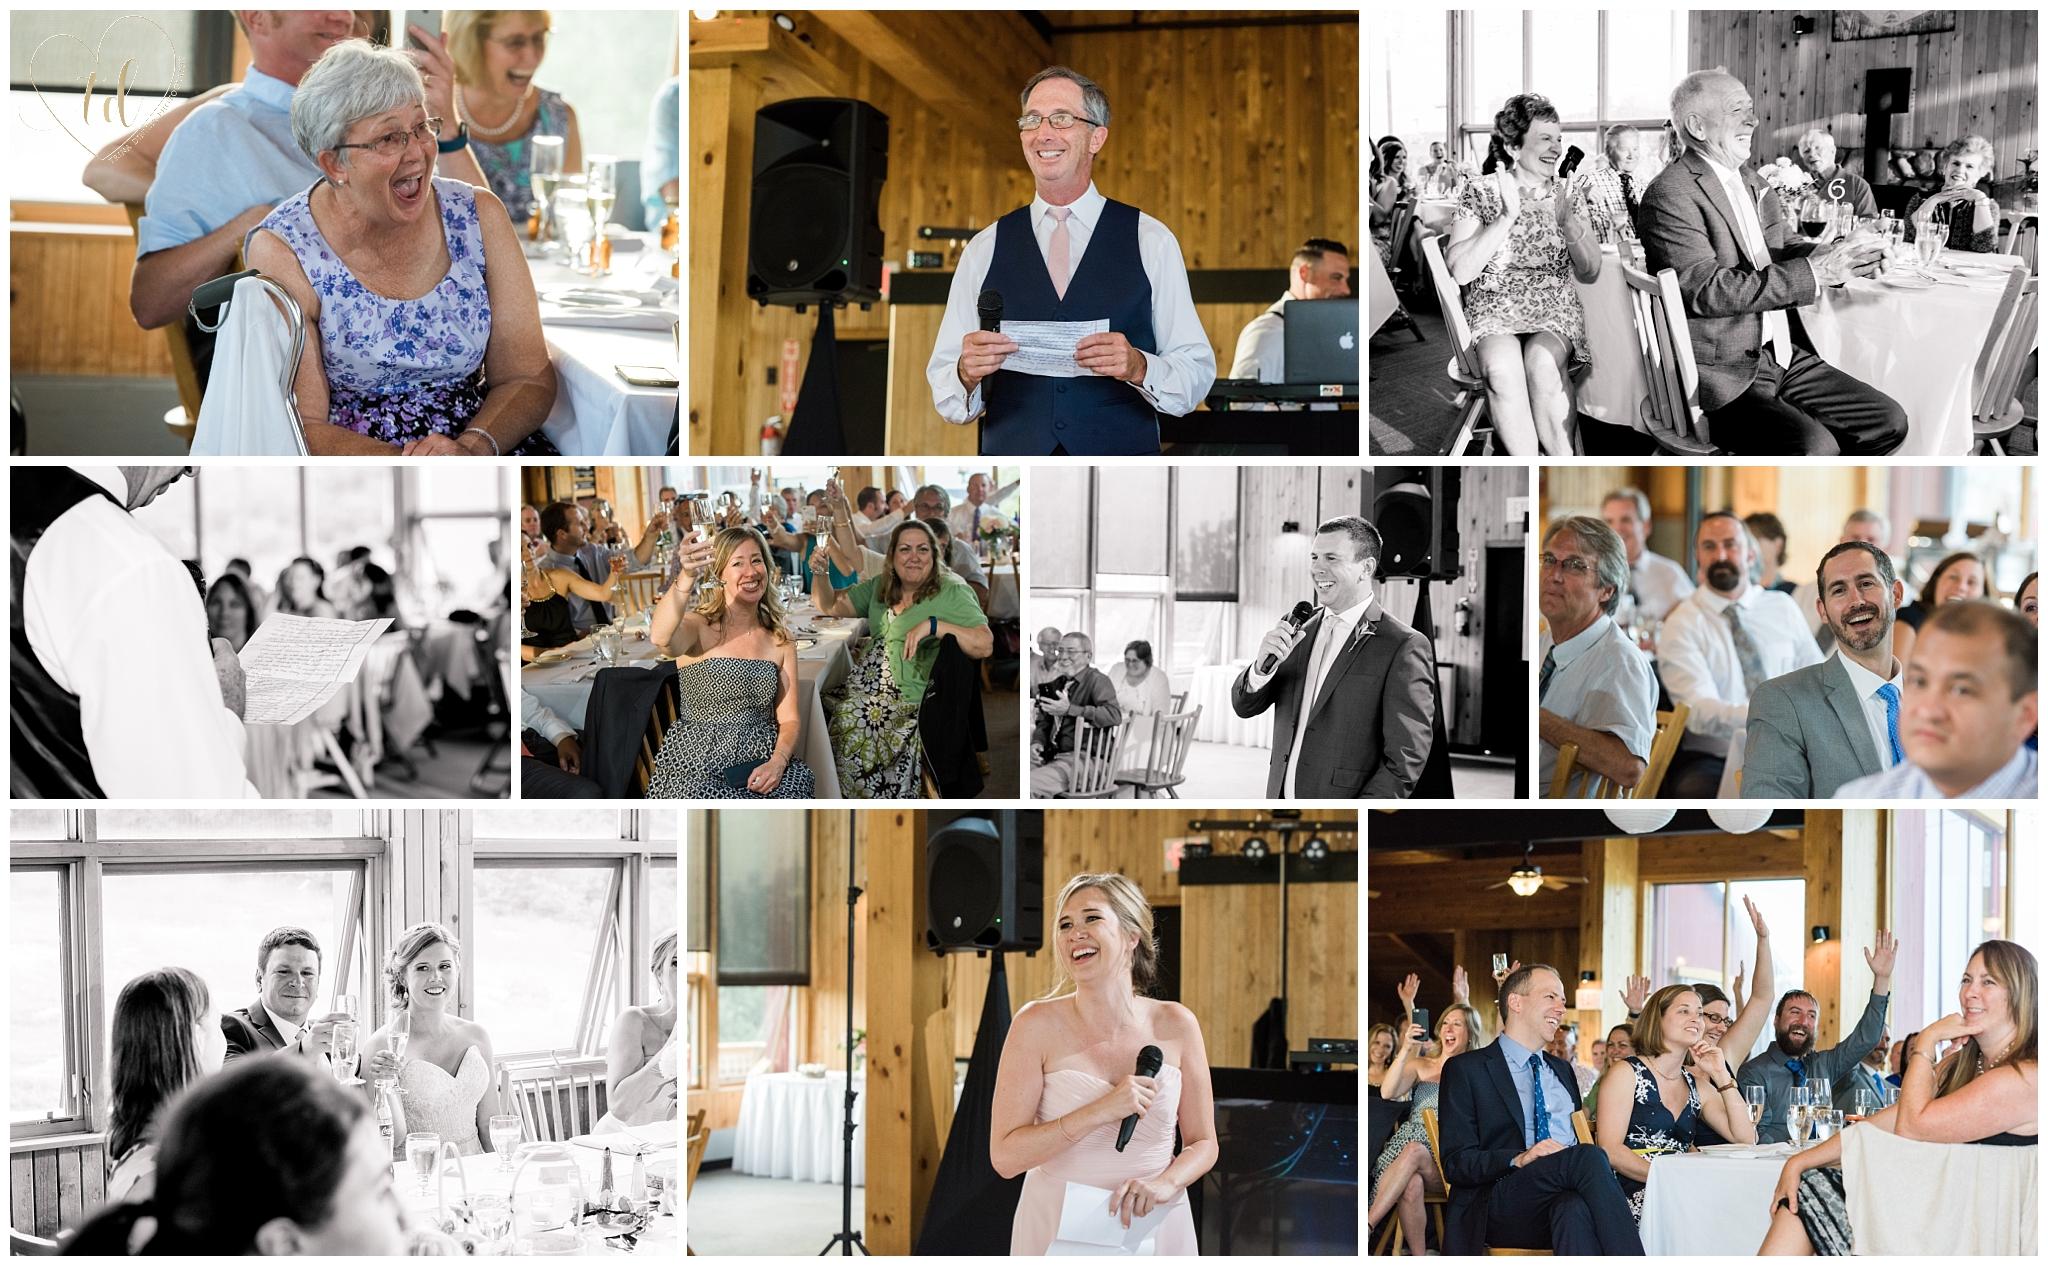 Wedding reception at peak lodge